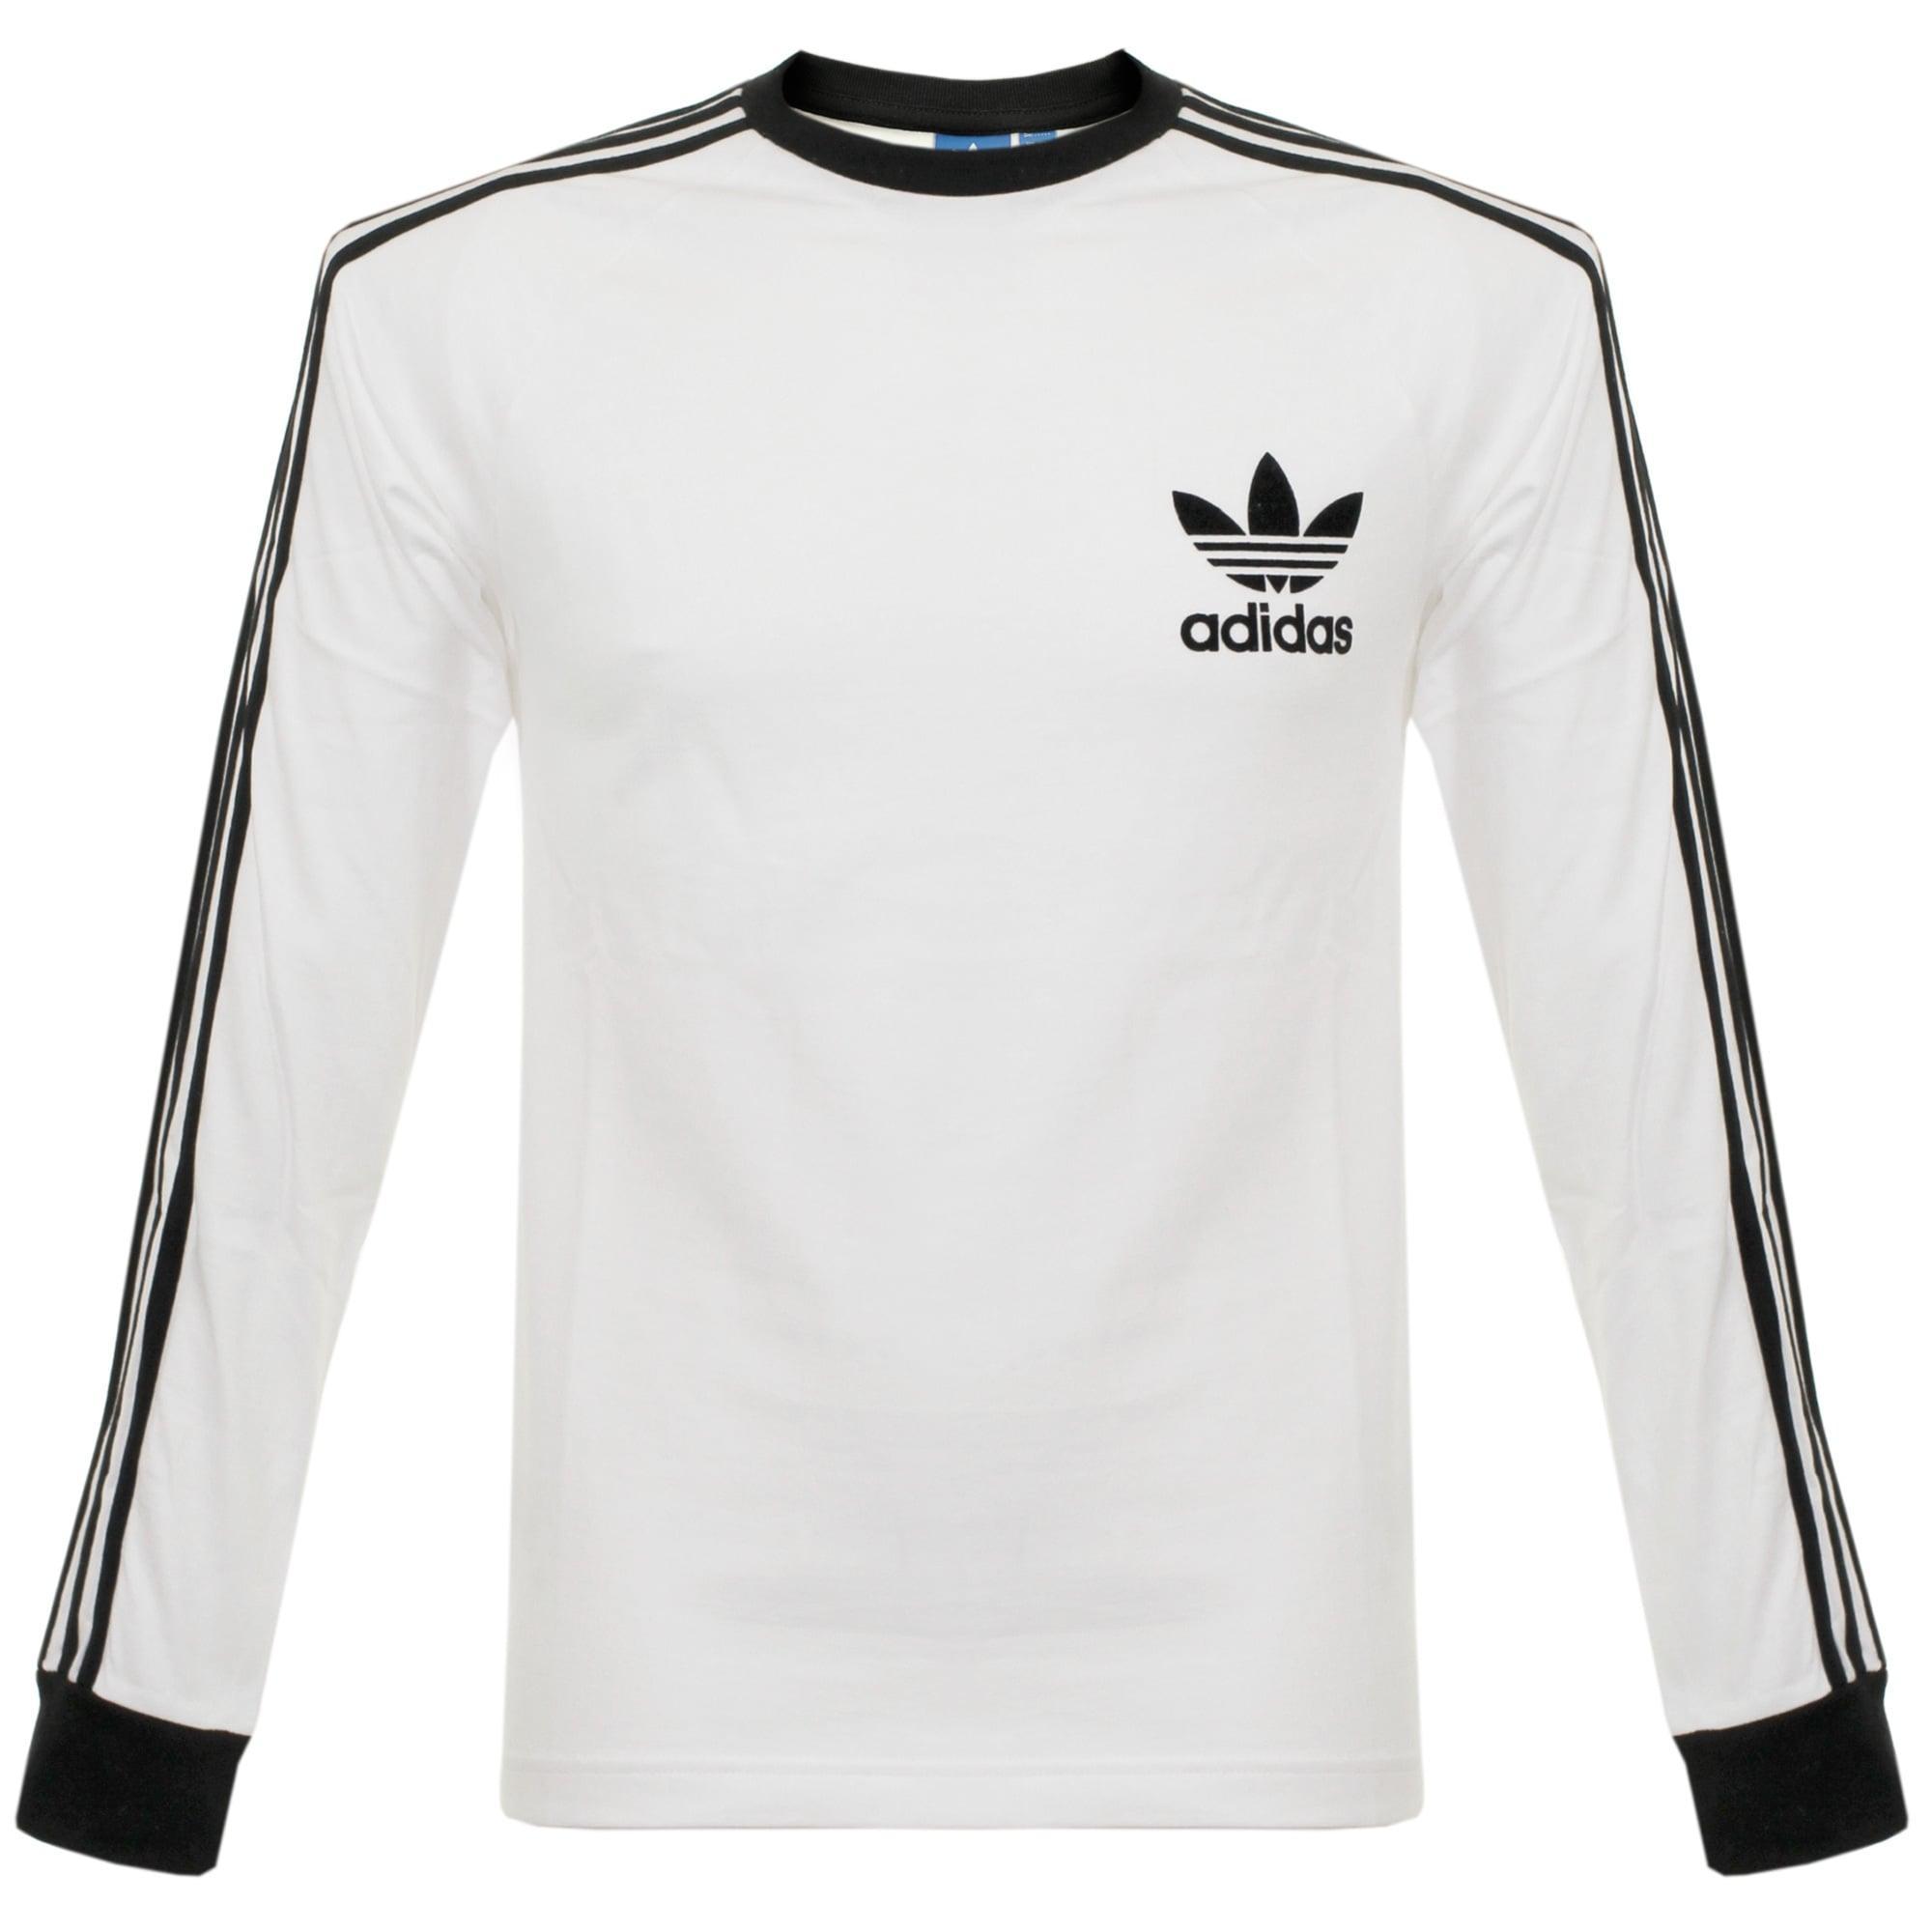 73371d15 adidas Originals Clfn Ls White T-shirt in White for Men - Lyst